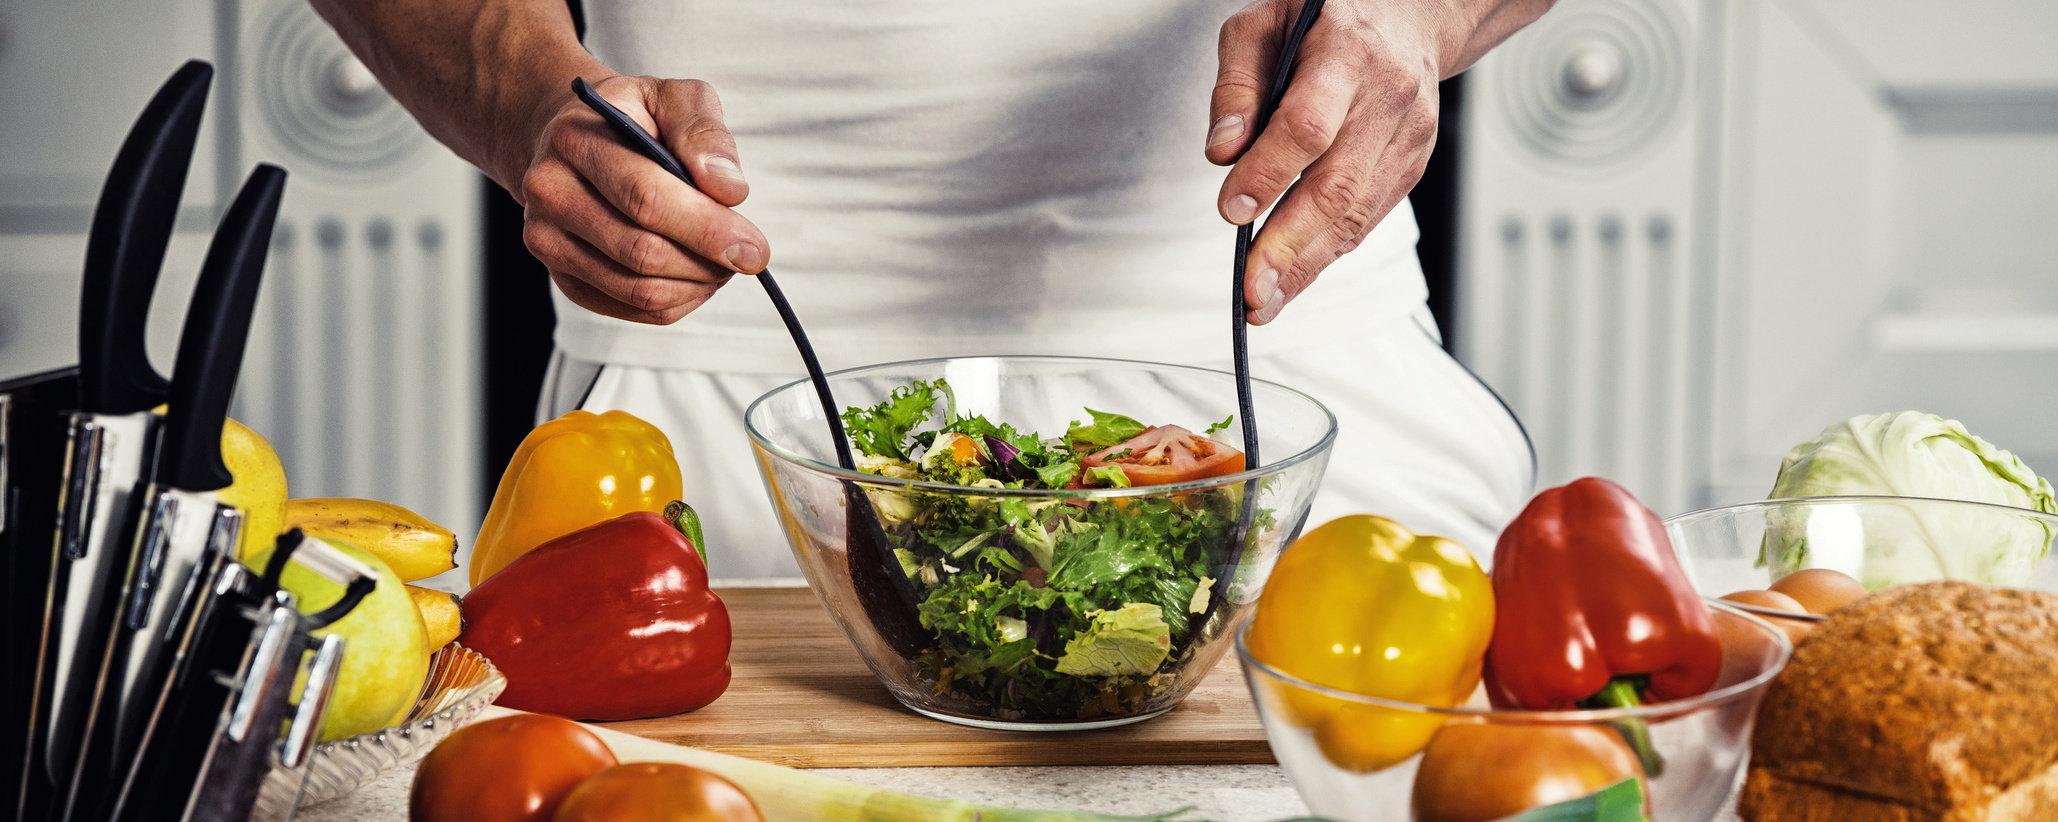 Franck etecuisine domicile franck t for Formateur en cuisine